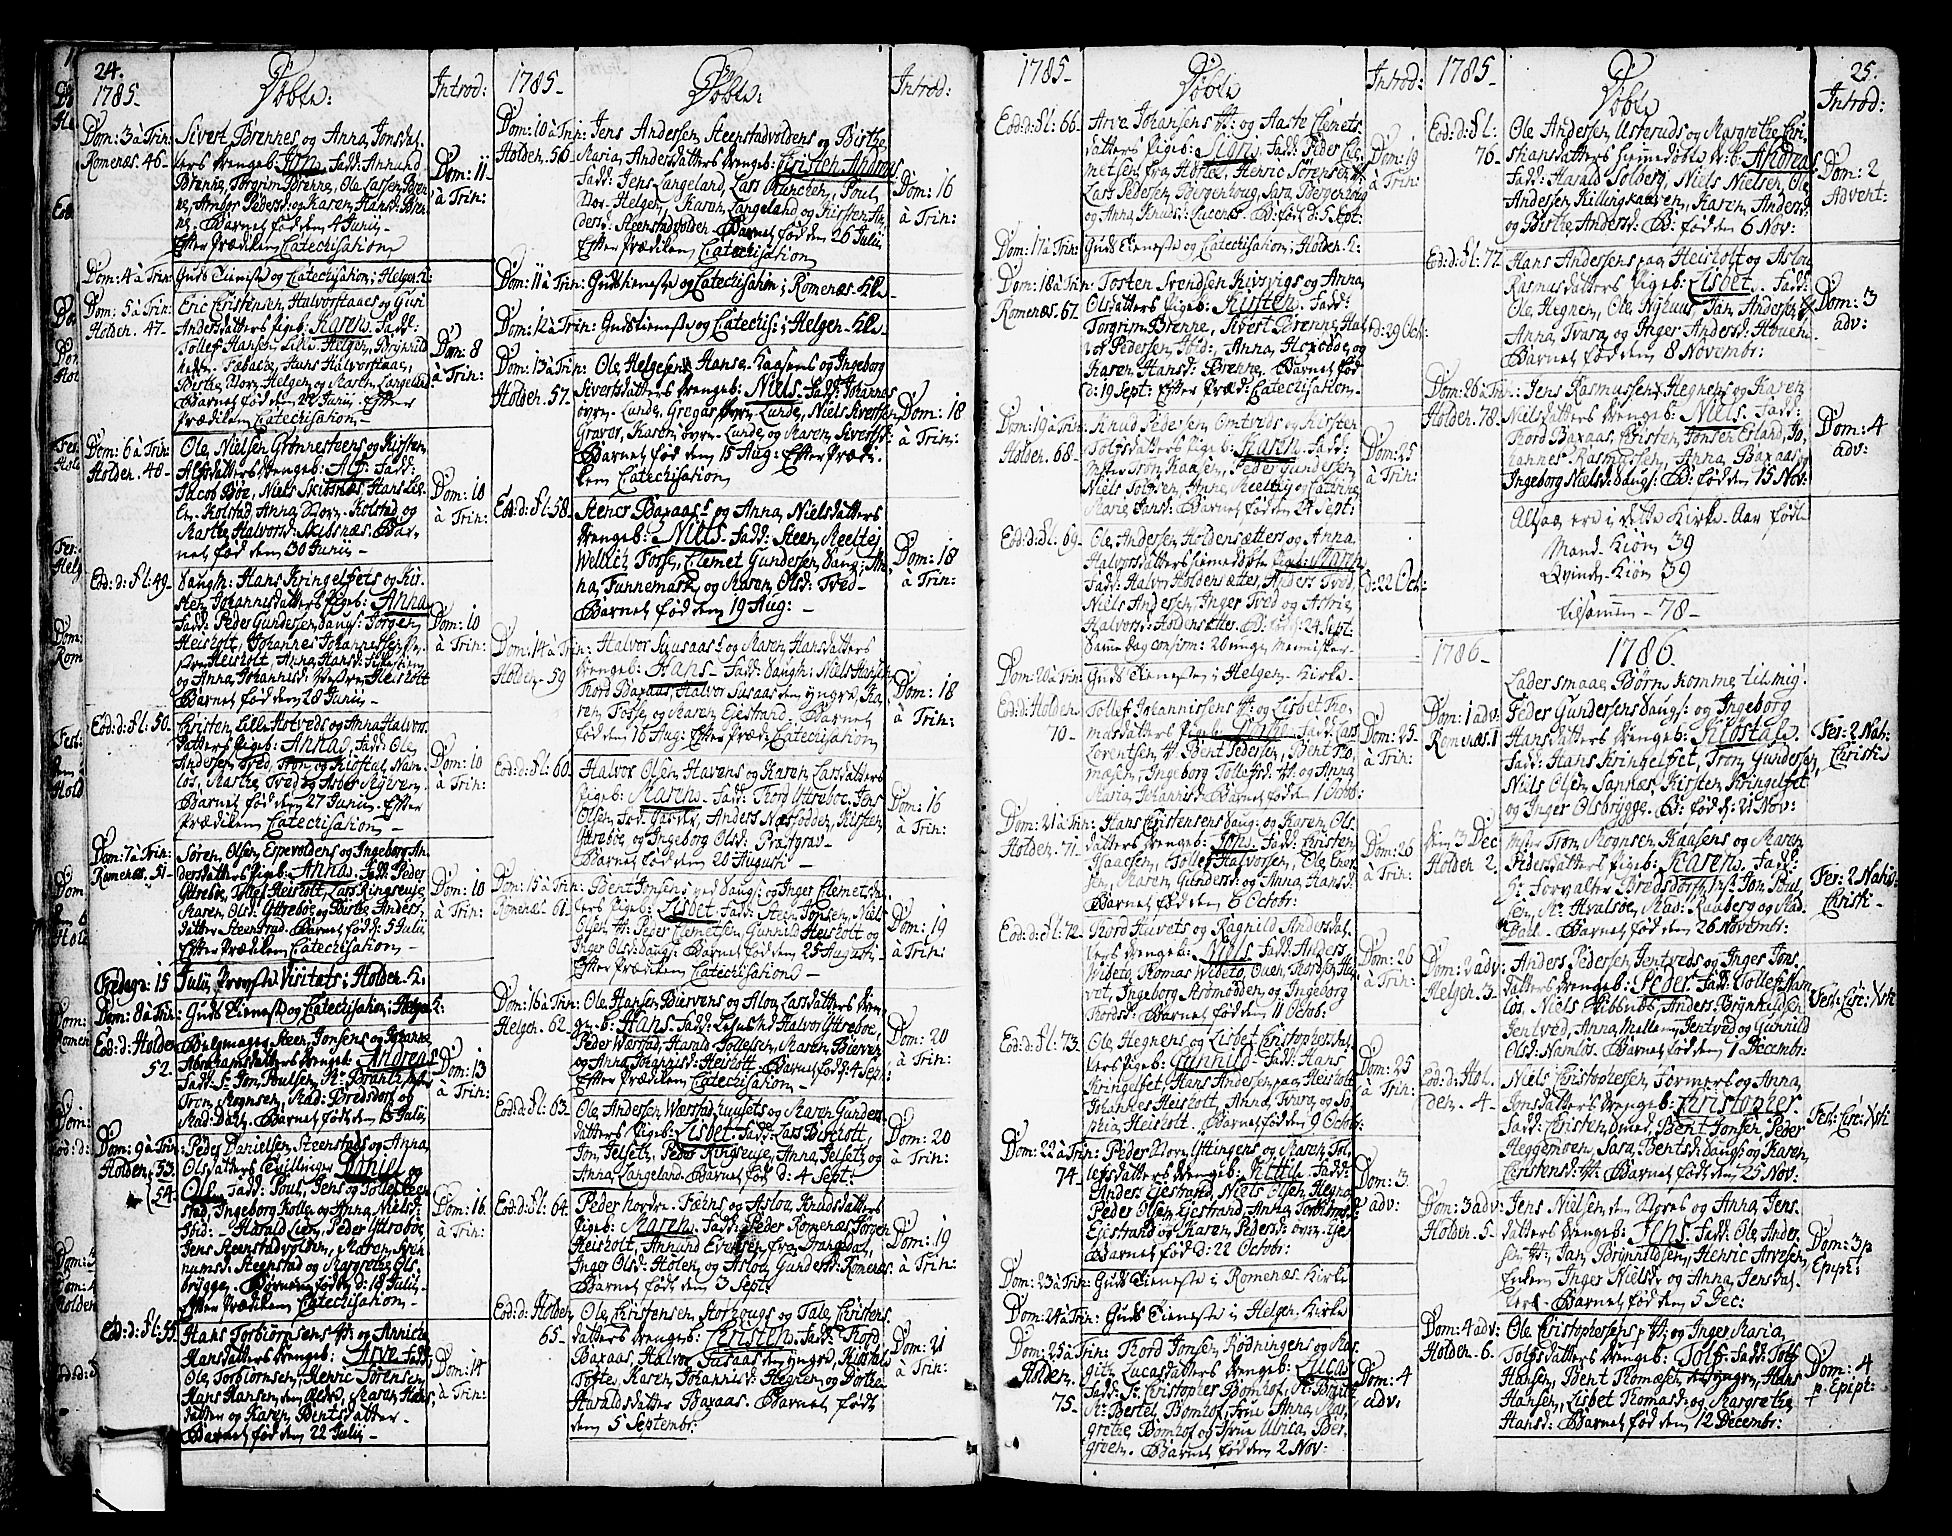 SAKO, Holla kirkebøker, F/Fa/L0002: Ministerialbok nr. 2, 1779-1814, s. 24-25